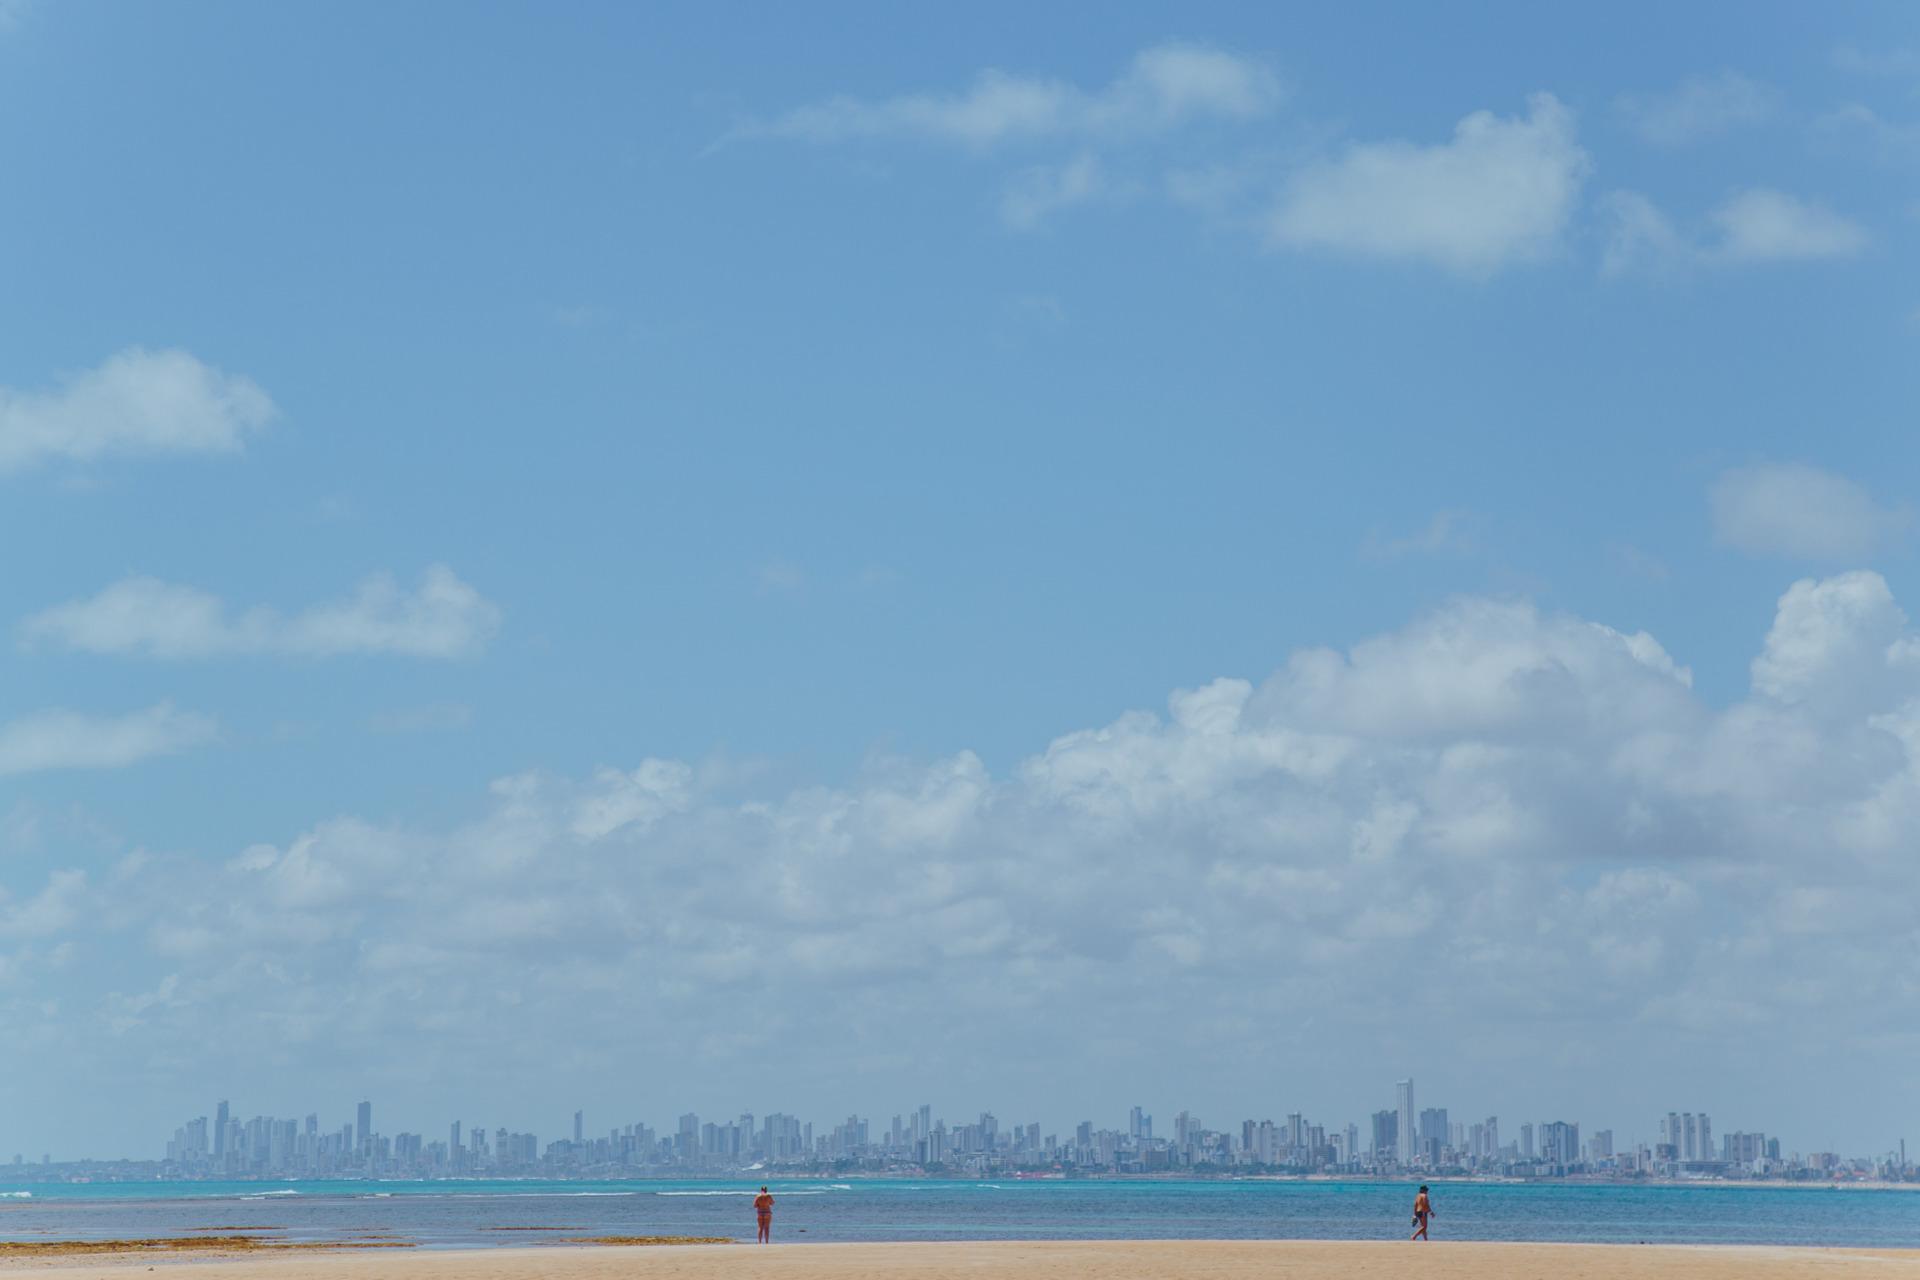 joao pessoa, paraiba, capital da paraiba, jampa, praia summer